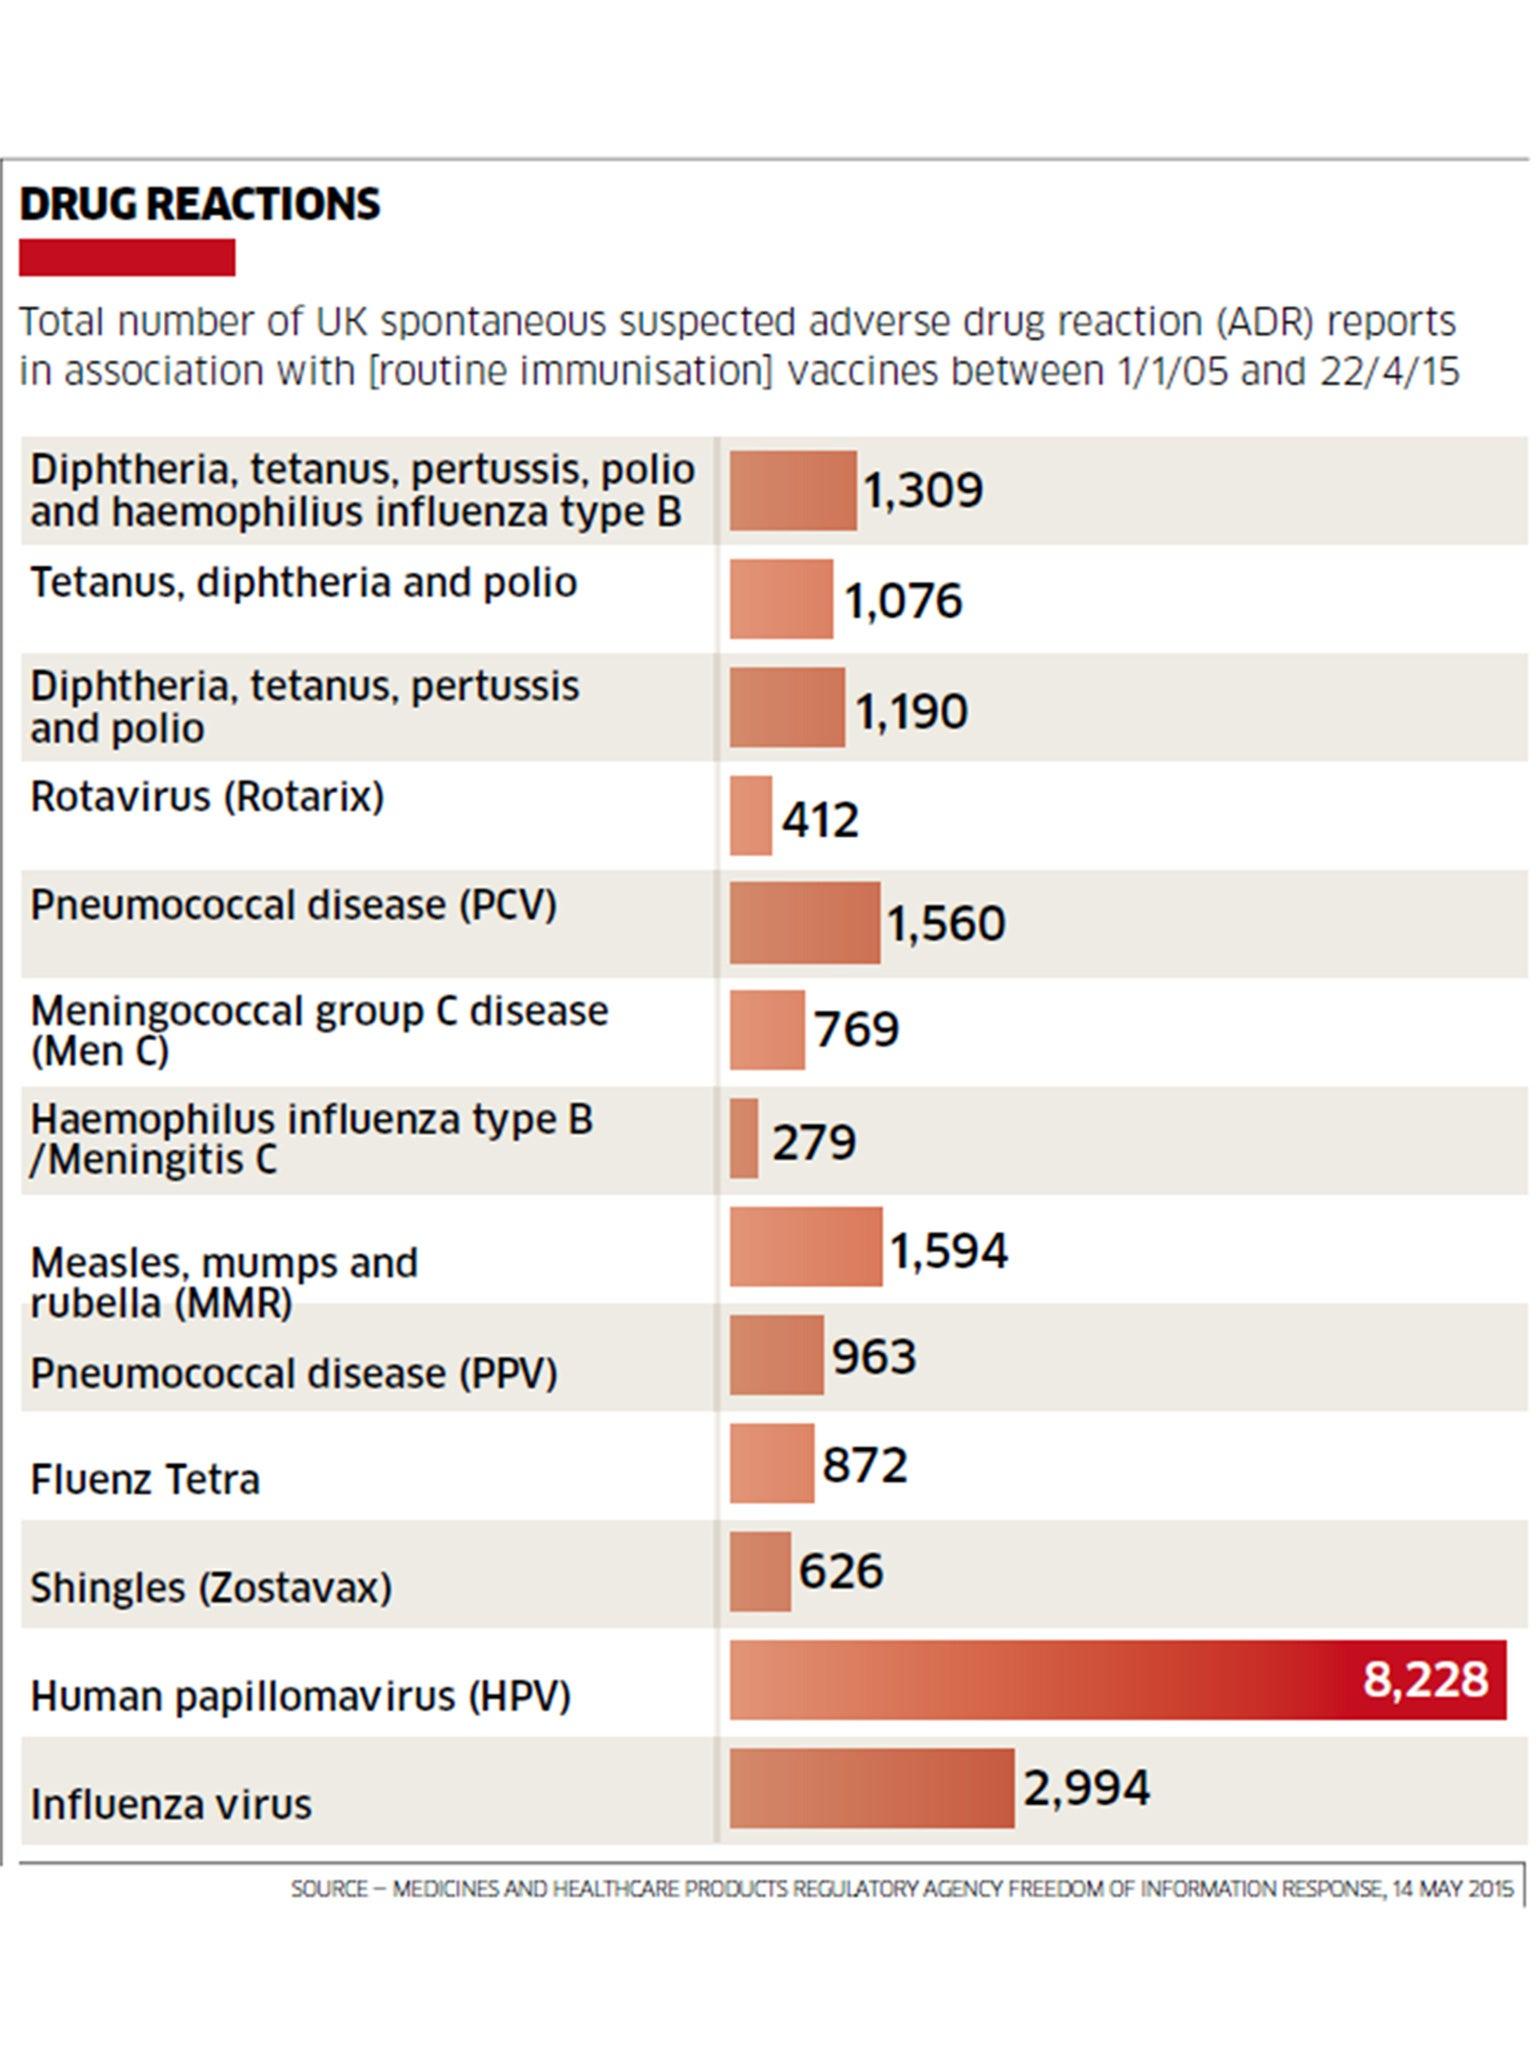 human papillomavirus vaccine side effects)